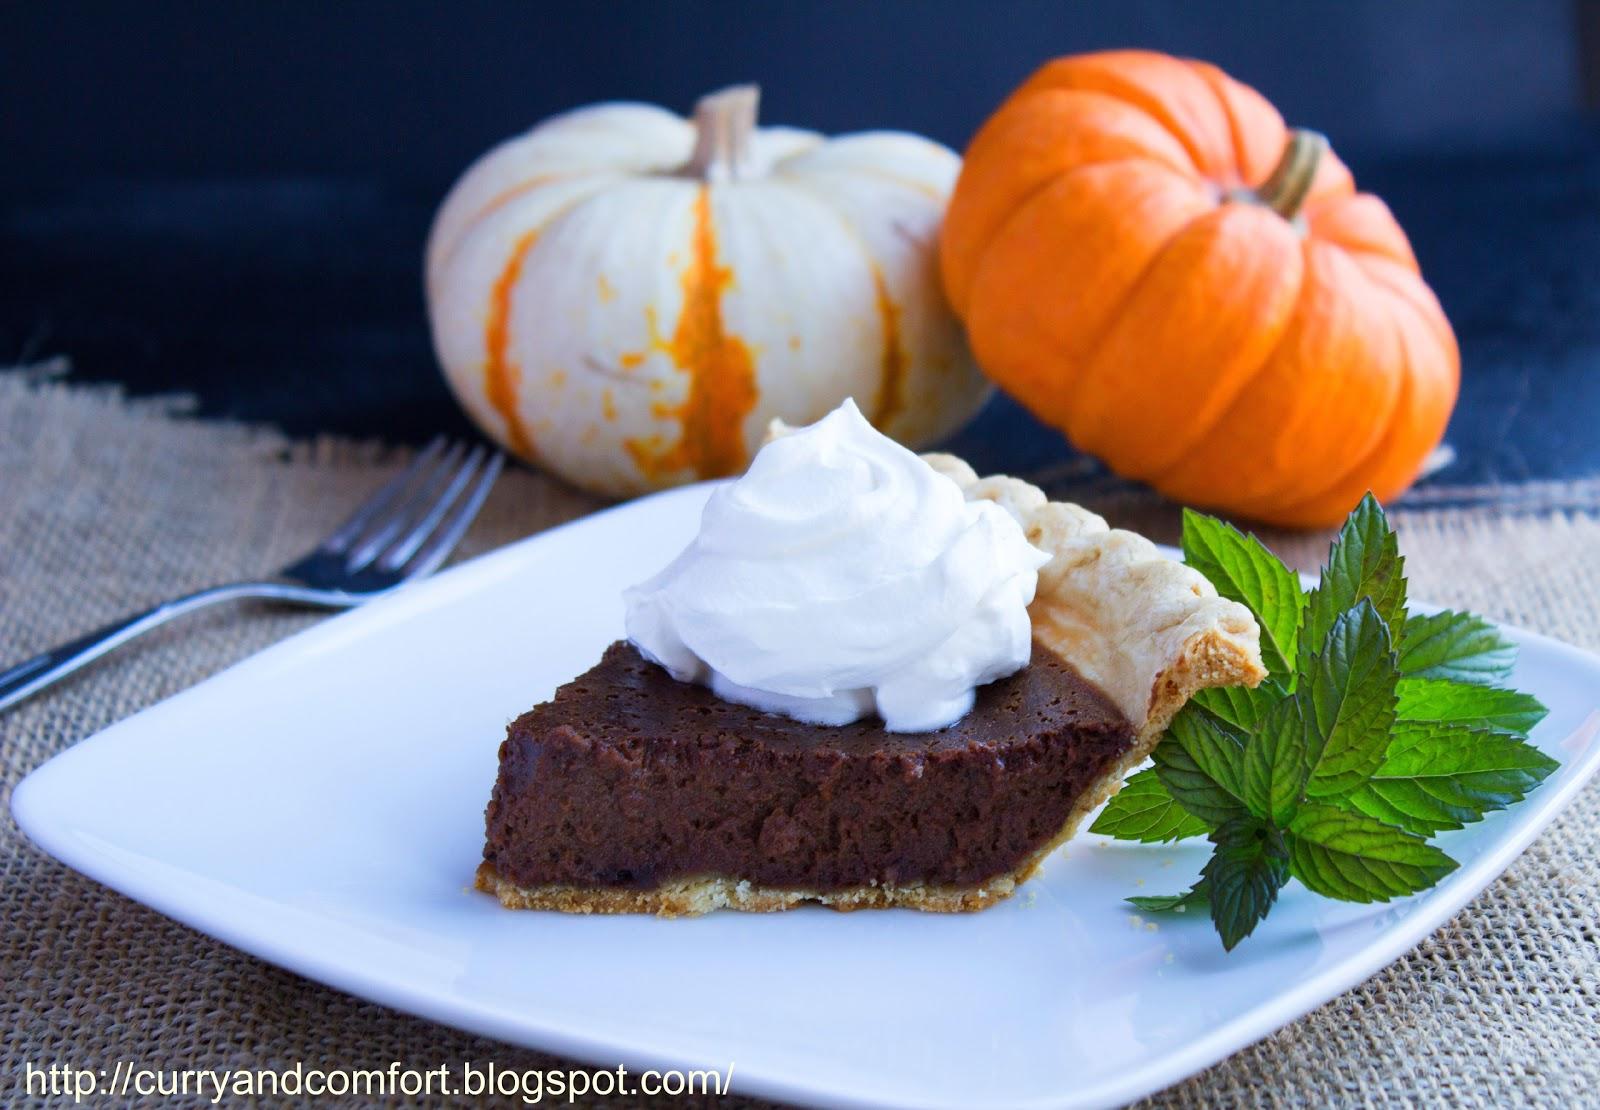 22 2012 chocolate pumpkin pie wednesday november 21 2012 pumpkin pie ...